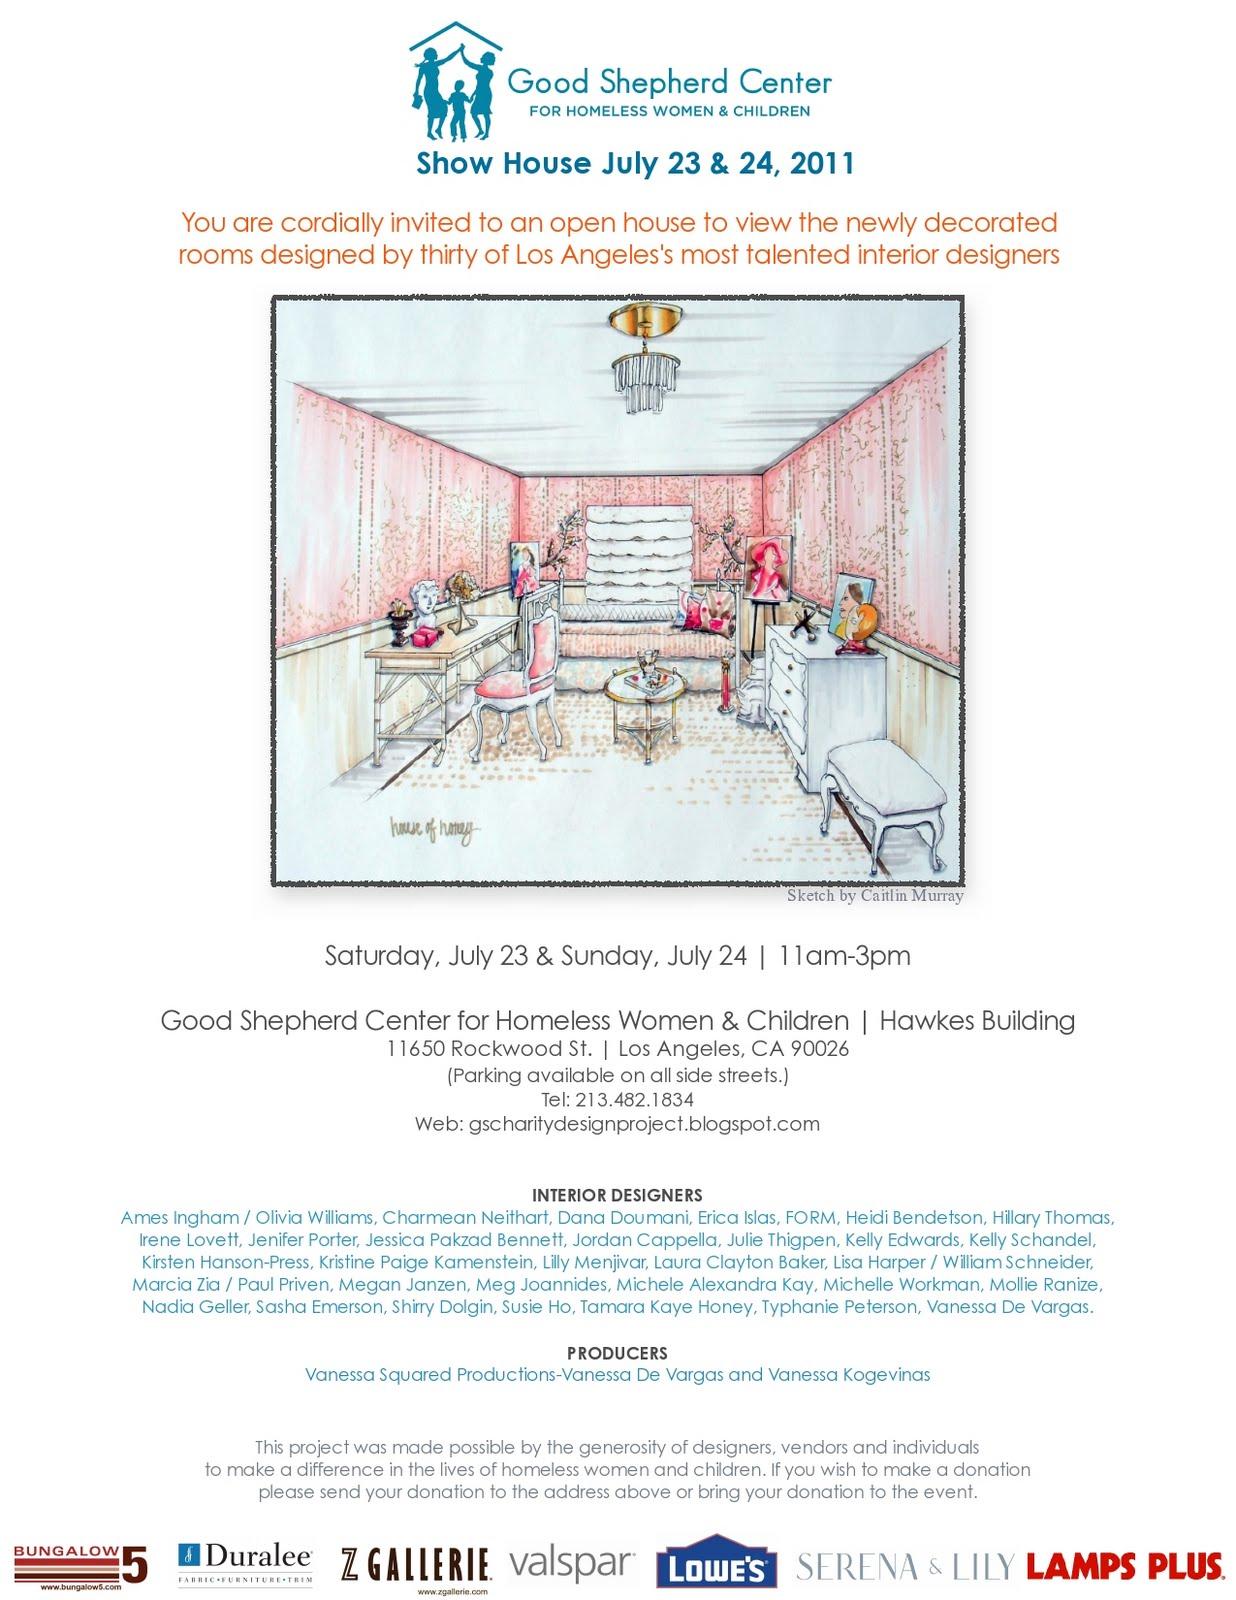 Good Shepherd Charity Design Project Invite